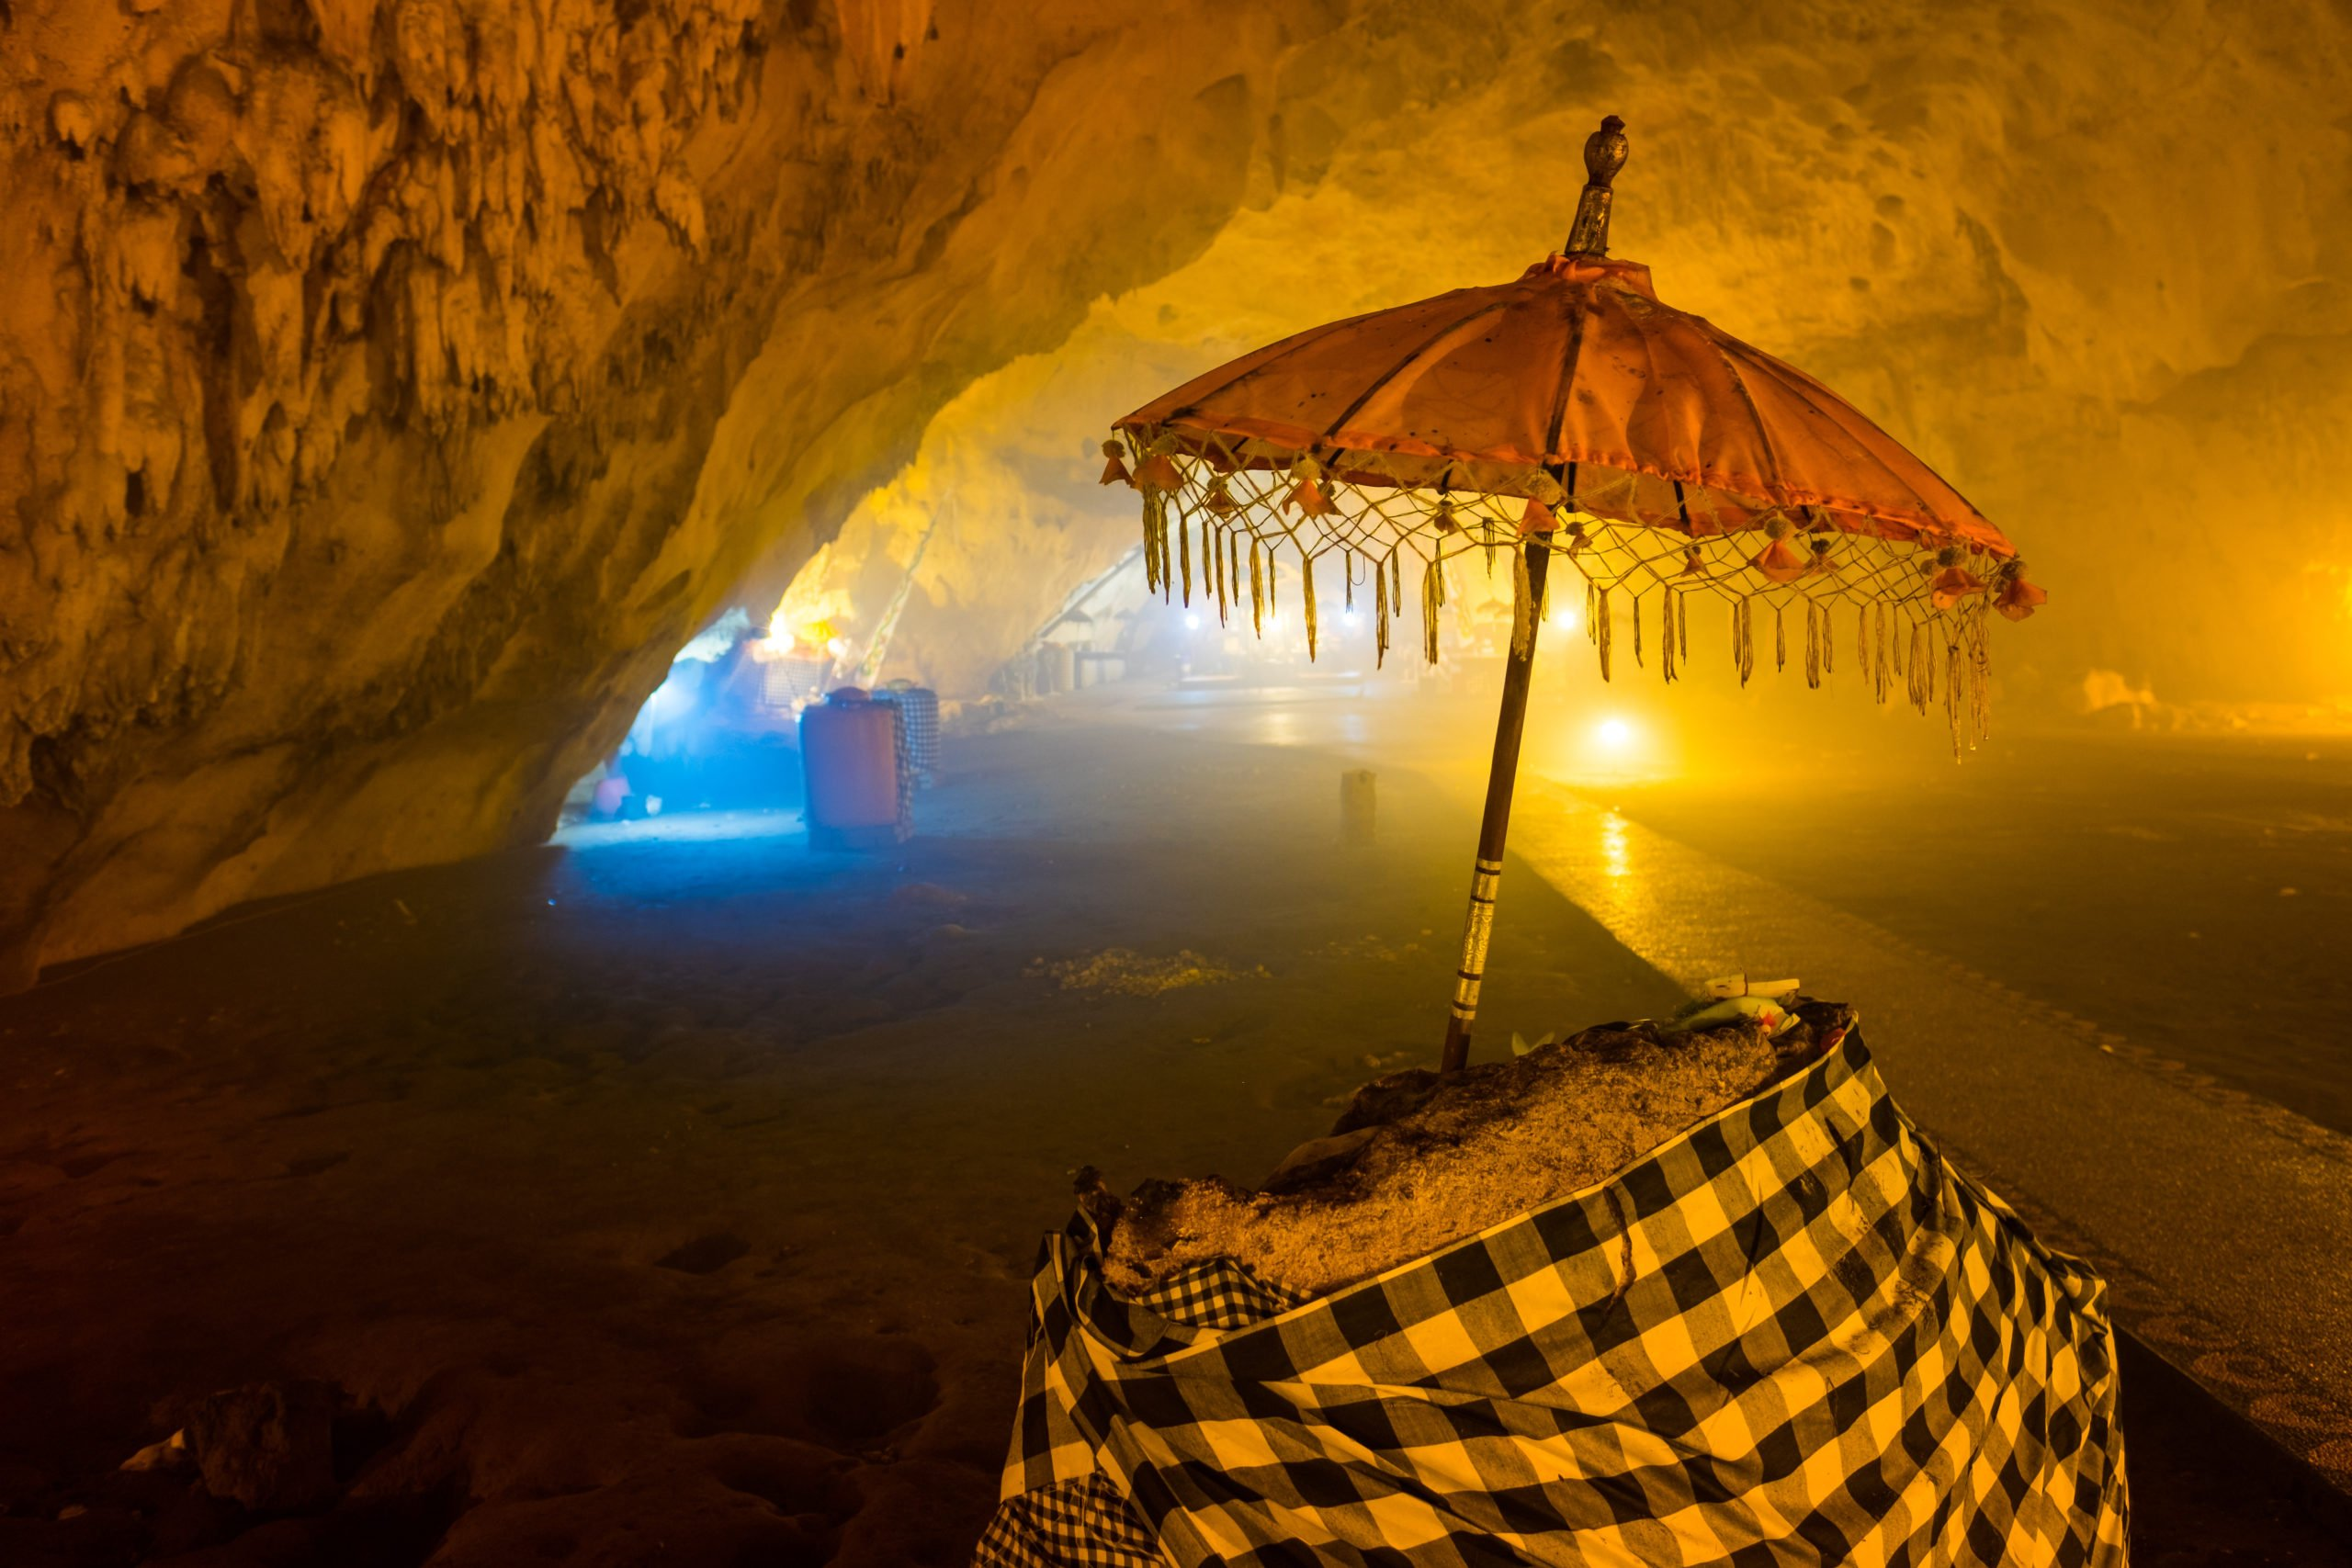 Visit The Goa Giri Putri Temple Situated In A Cave During The Penida Island Tour From Ubud, Sanur, Nusa Dua, Tanjung Benoa, Seminyak